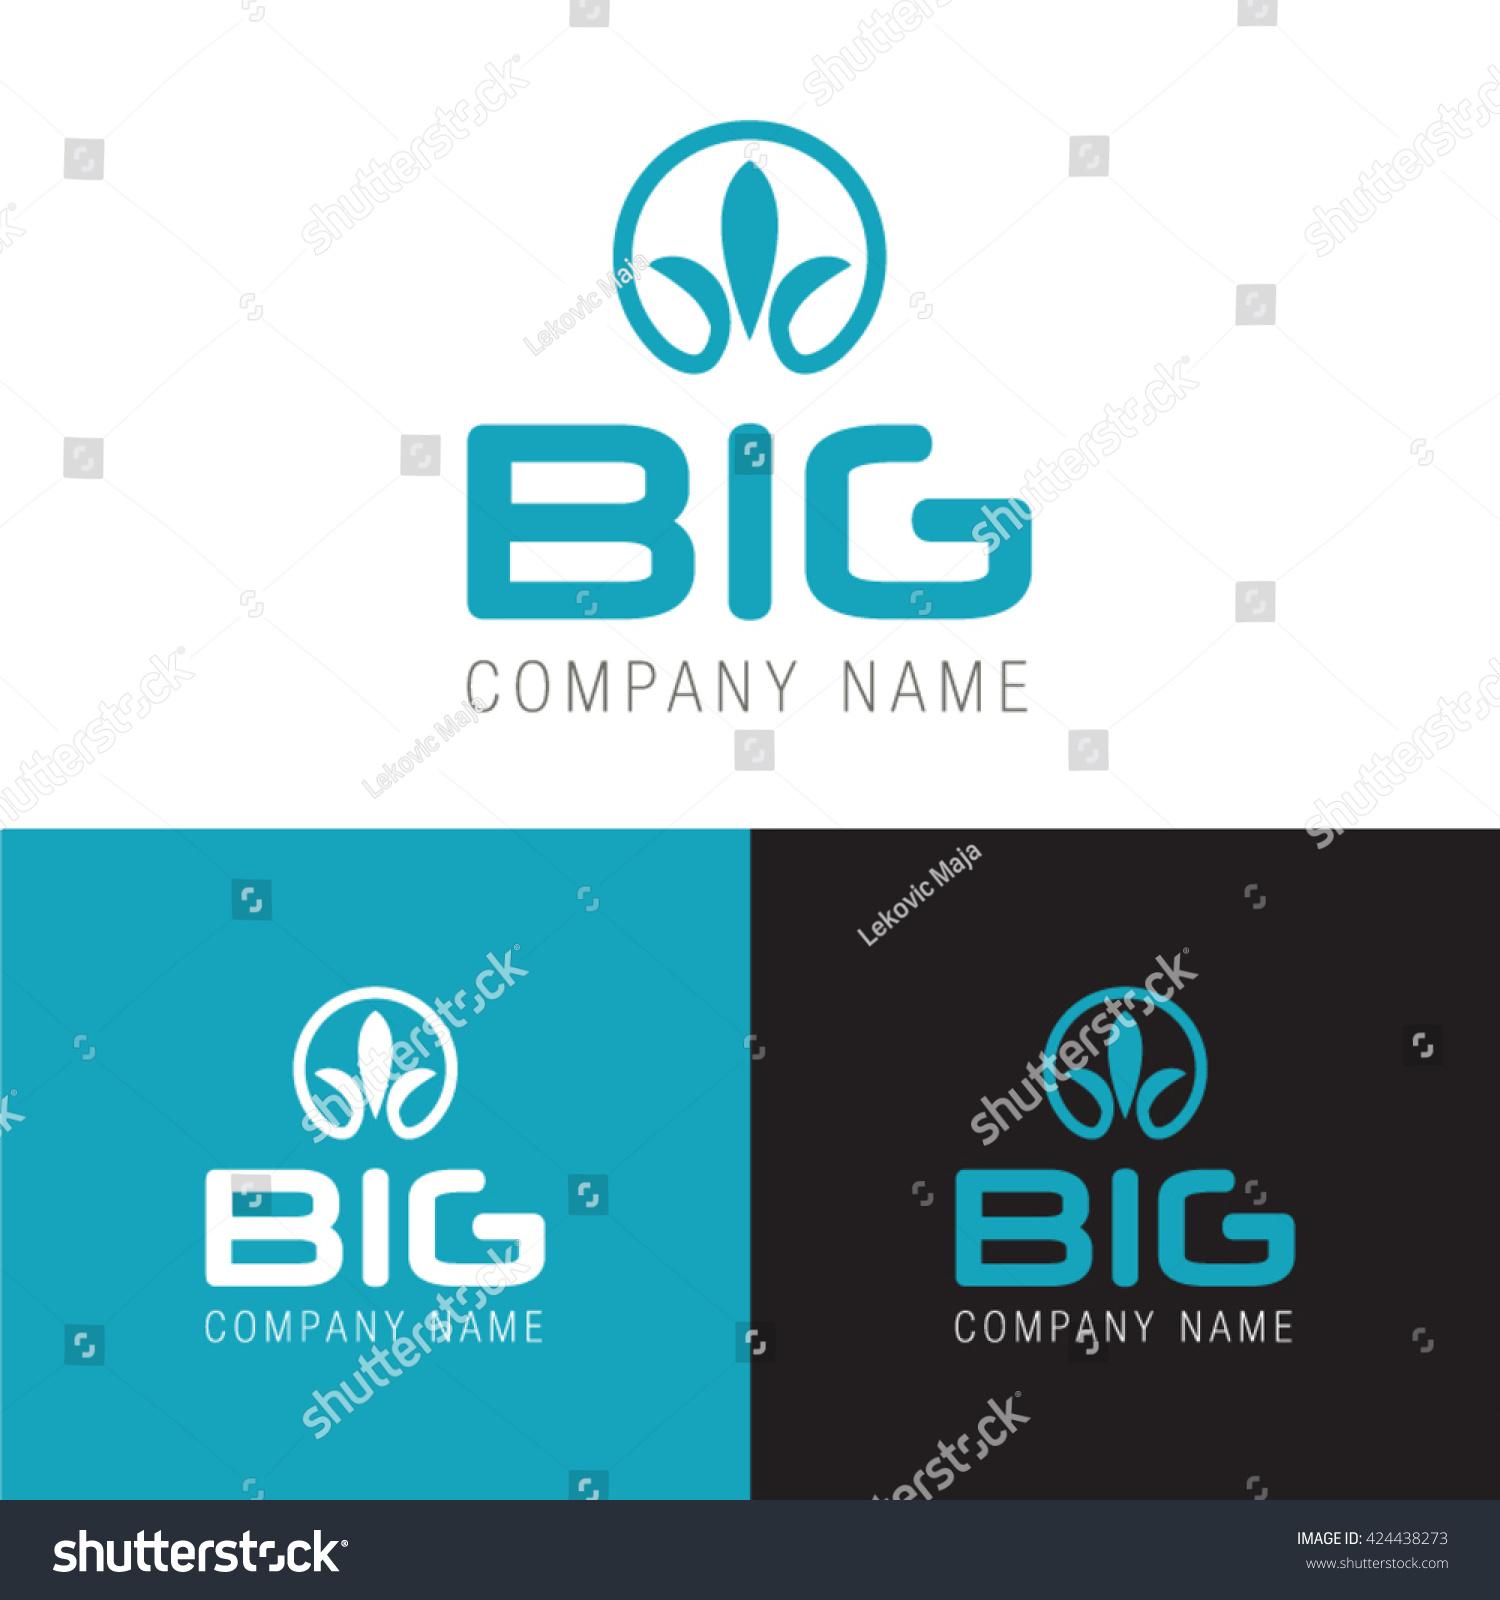 Big company name logo modern symbol stock vector 424438273 big company name logo with modern symbol design logo element buycottarizona